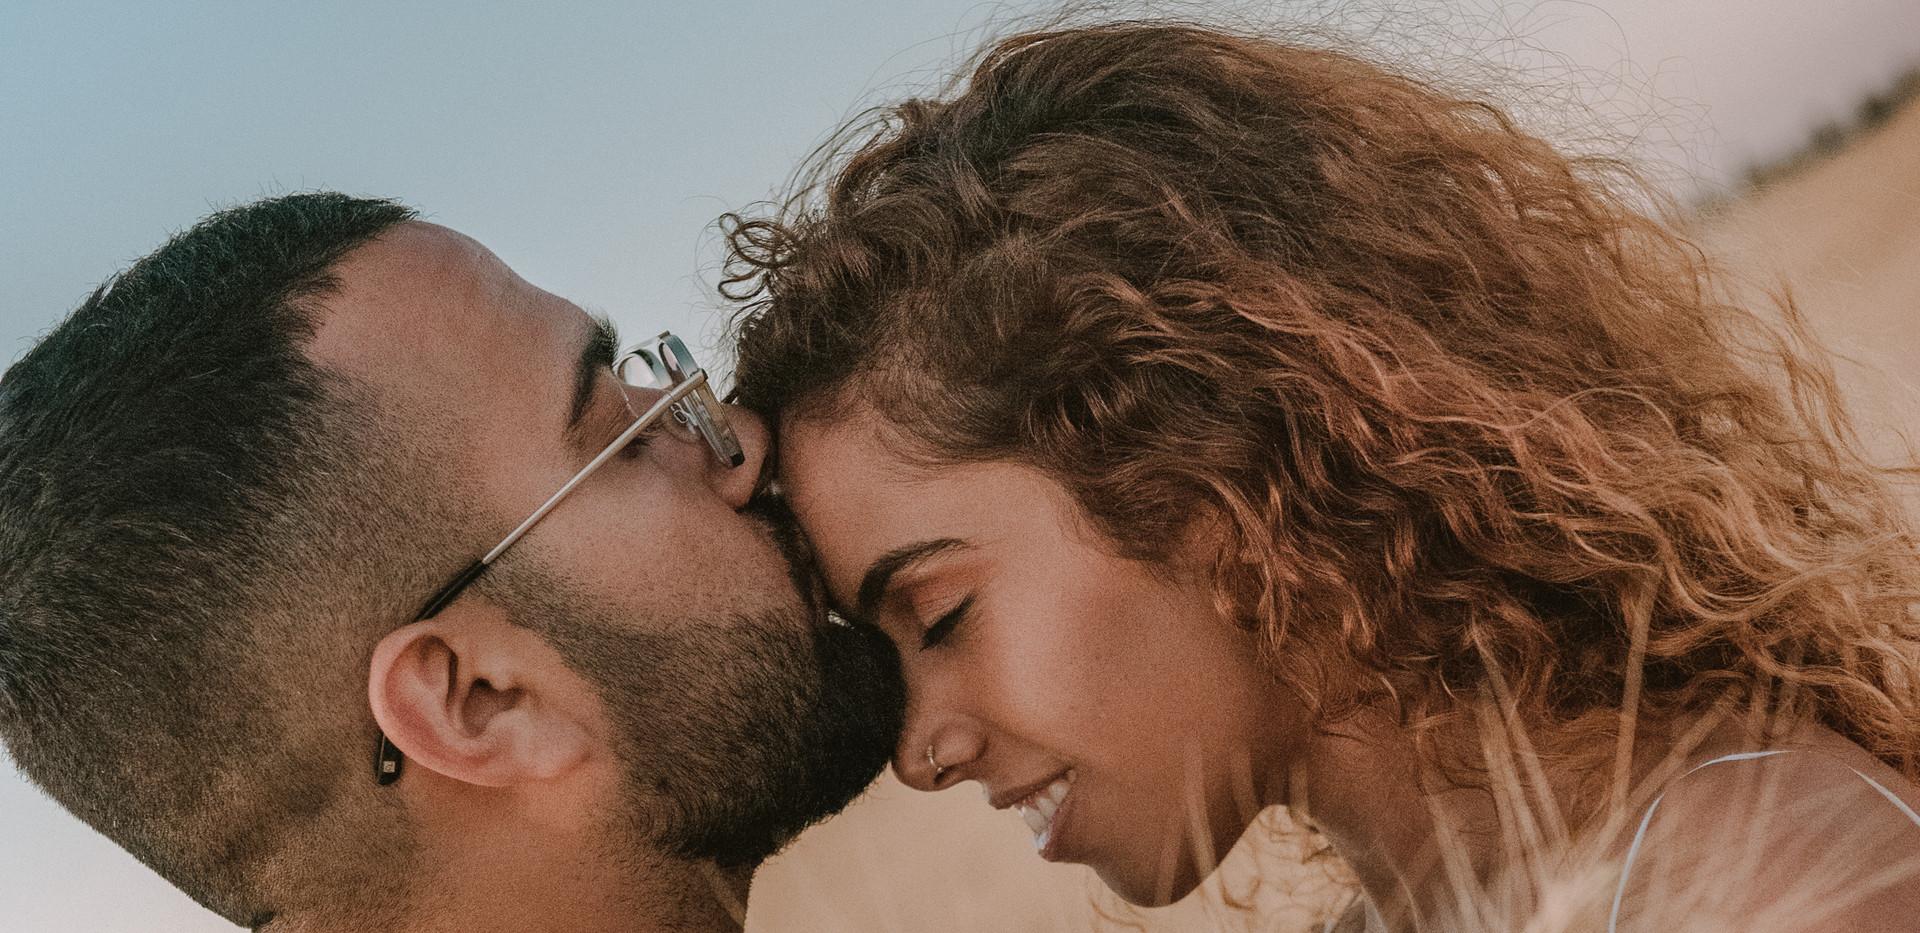 Oriya & Netanel